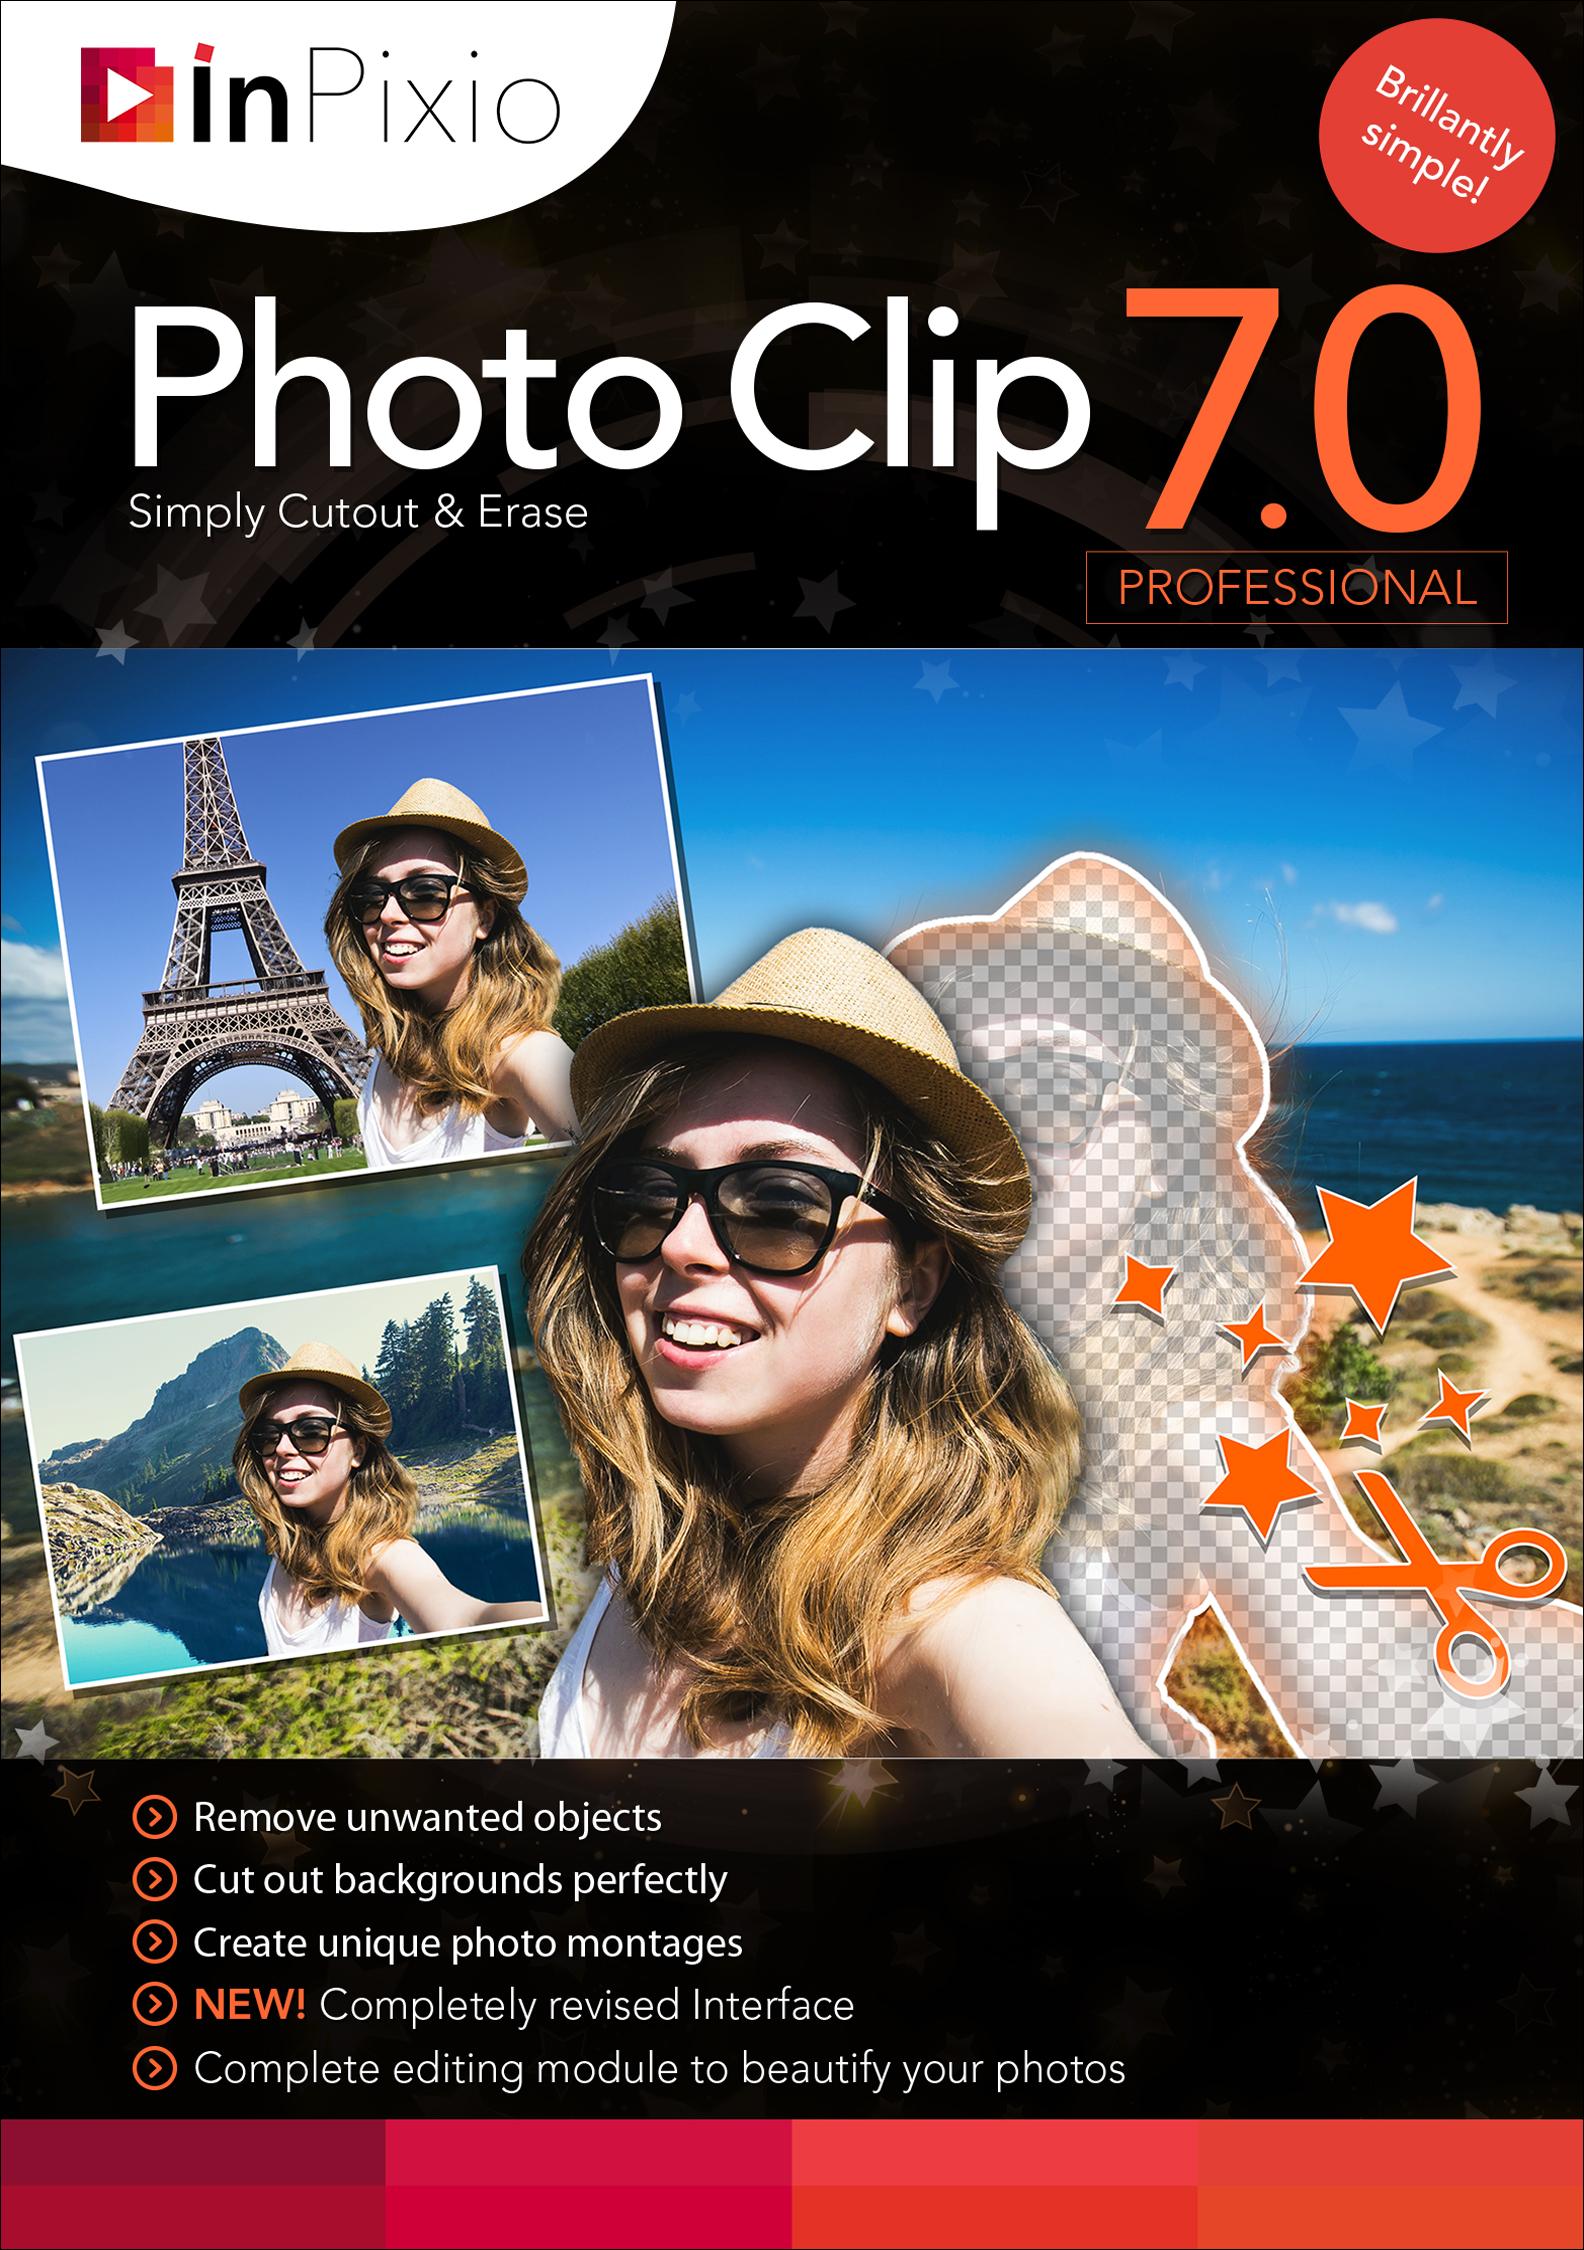 InPixio Photo Clip 7.0 Professional [Download]